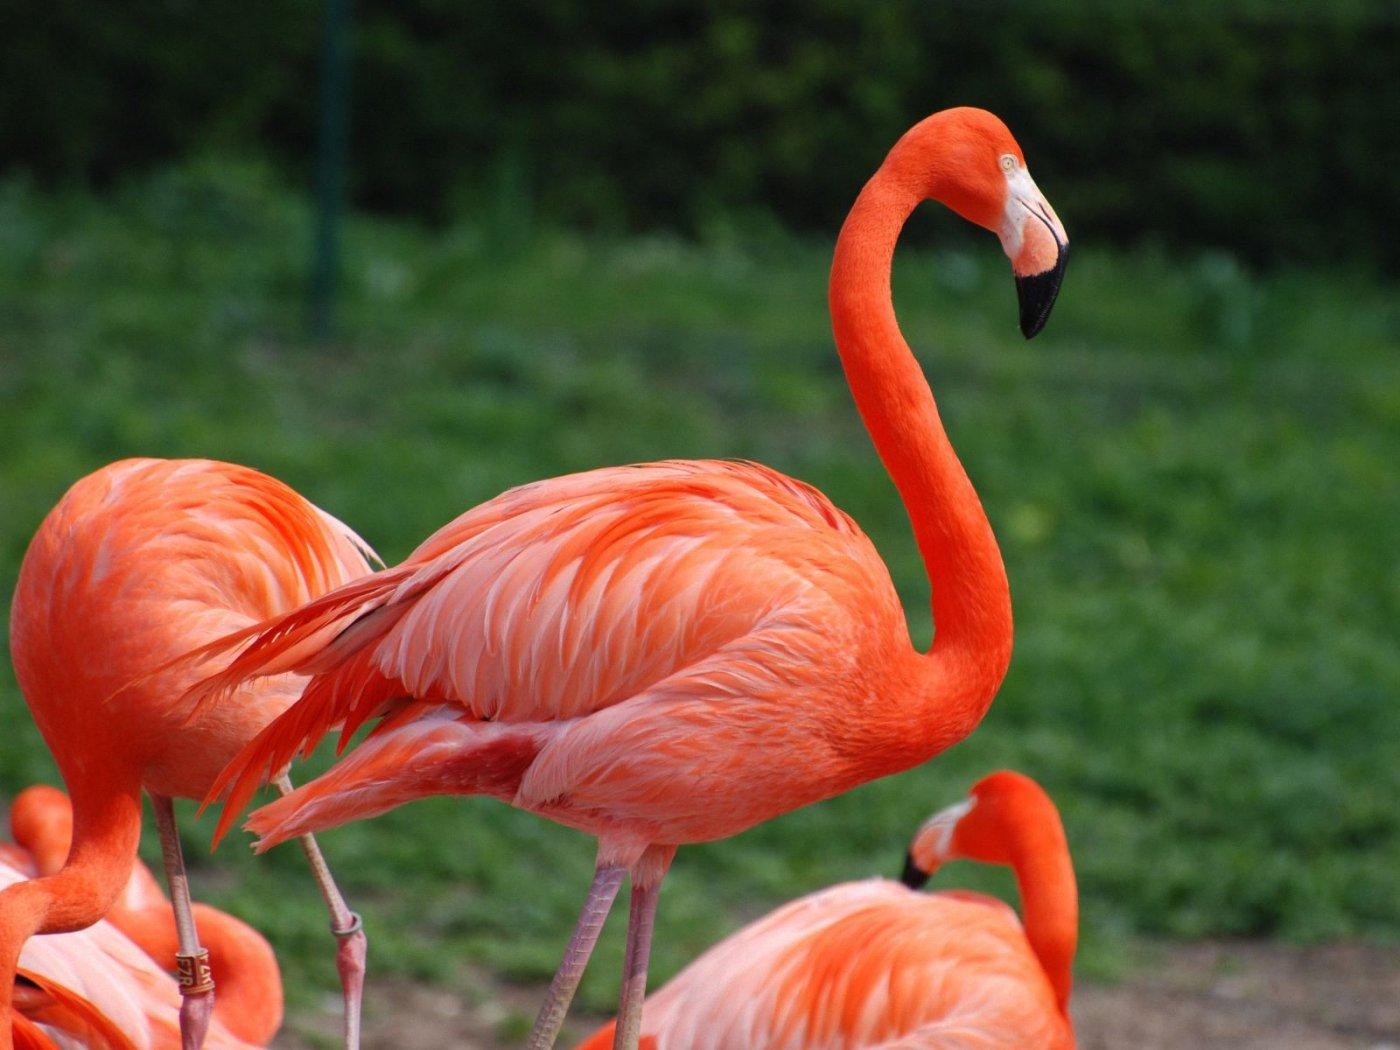 بالصور صور طيور , مجموعه صور طيور زينه رائعه 2404 9